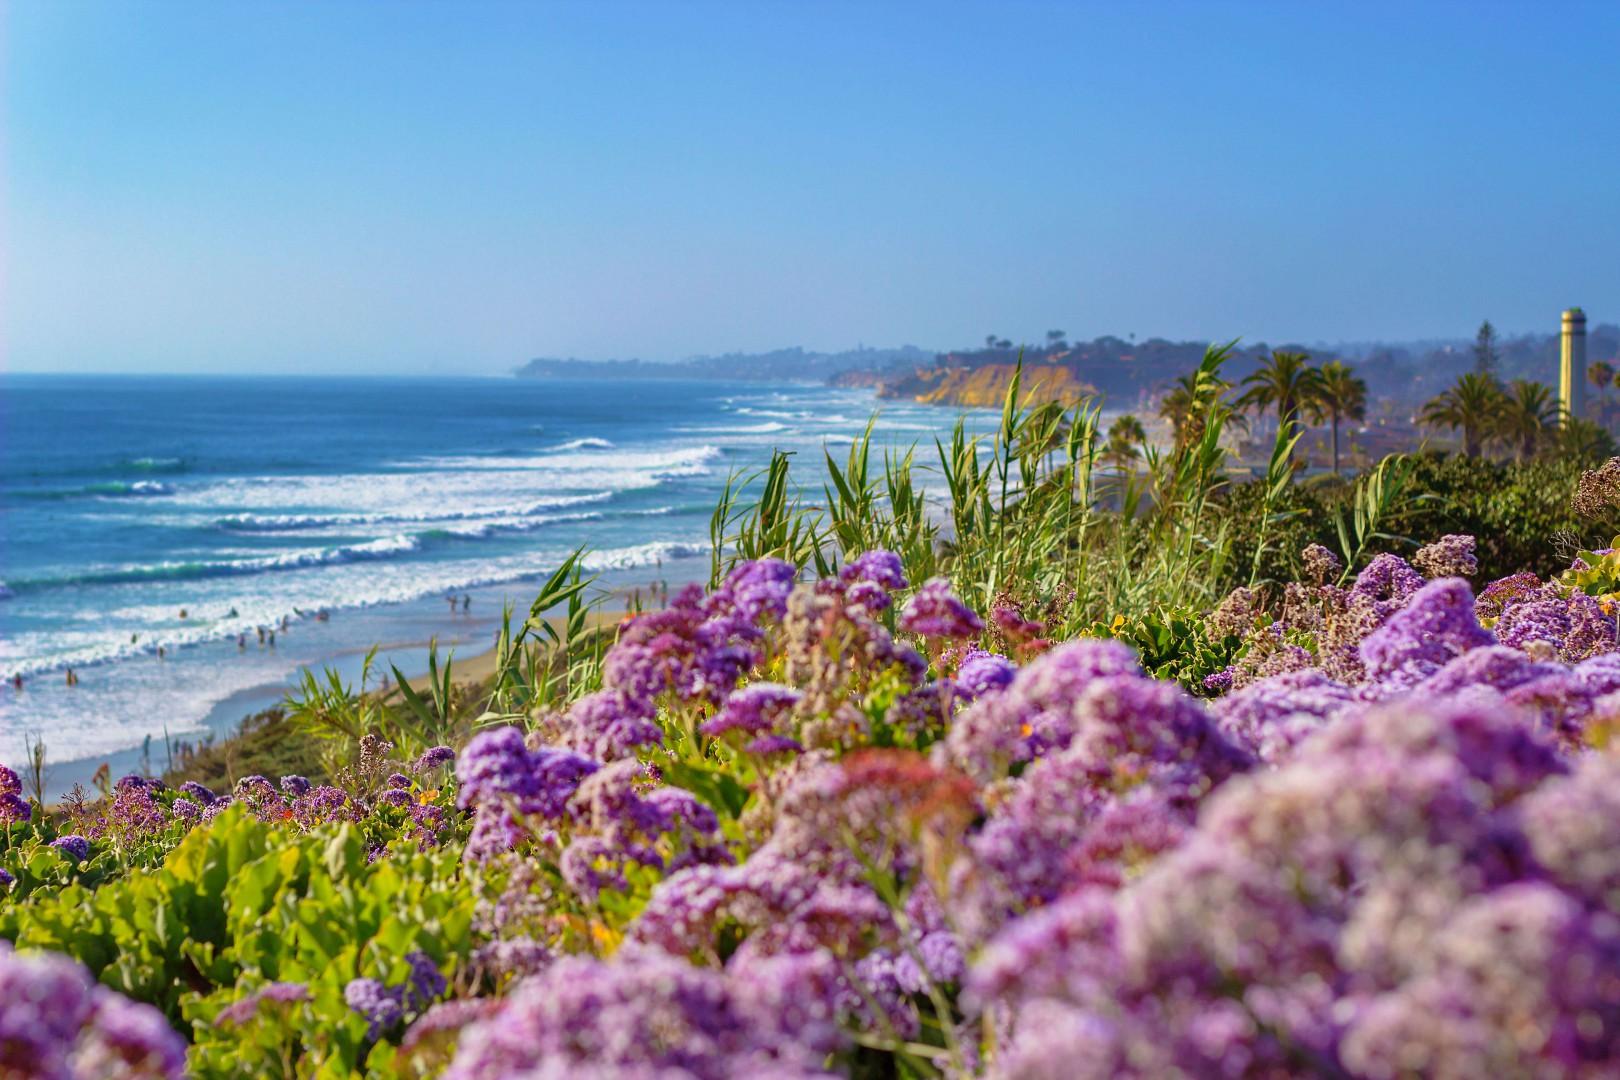 Beautiful beach view in Del Mar County California